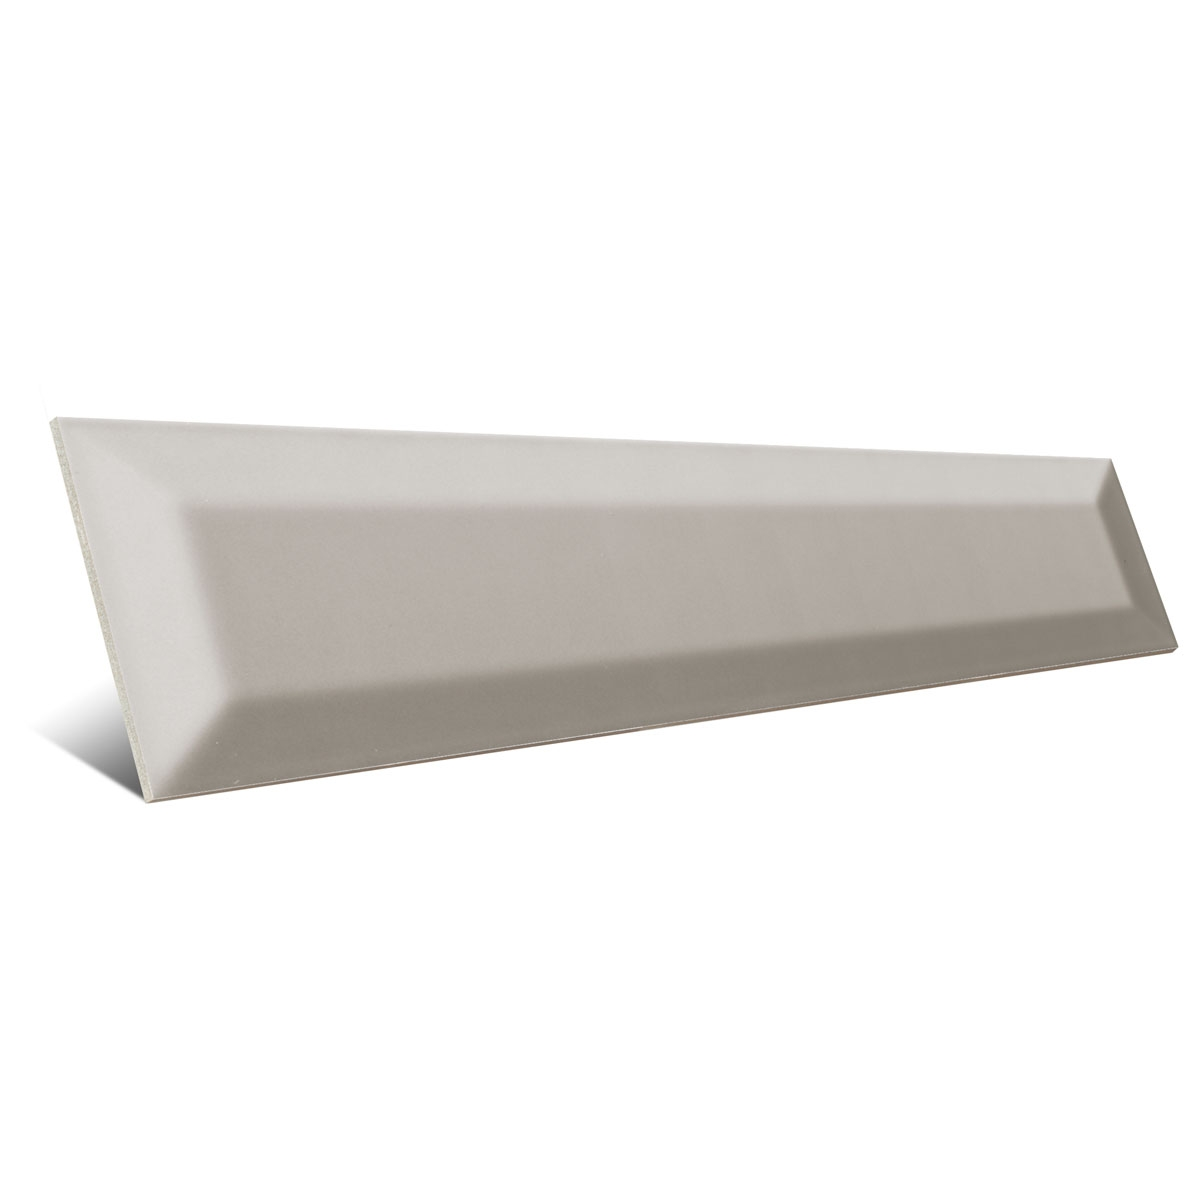 Settecento bissel gris brillo 7.5x30